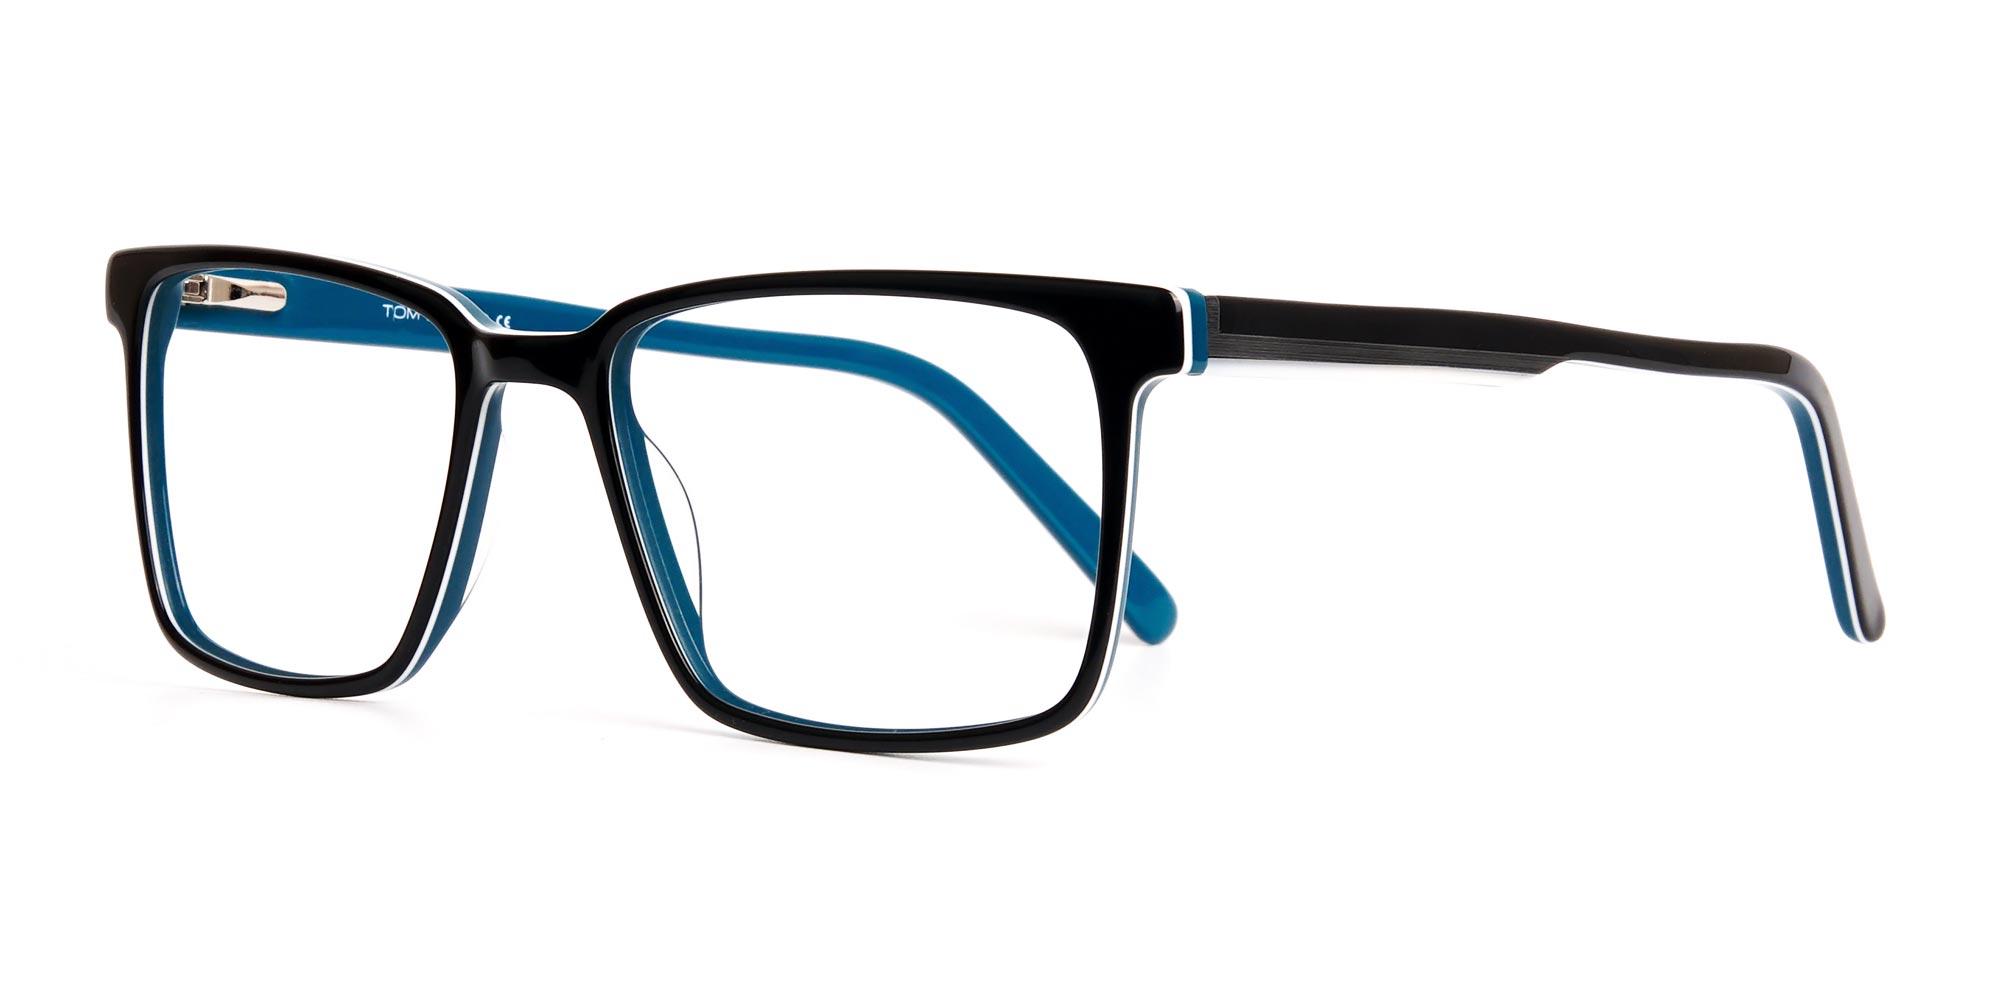 black-and-teal-designer-rectangular-glasses